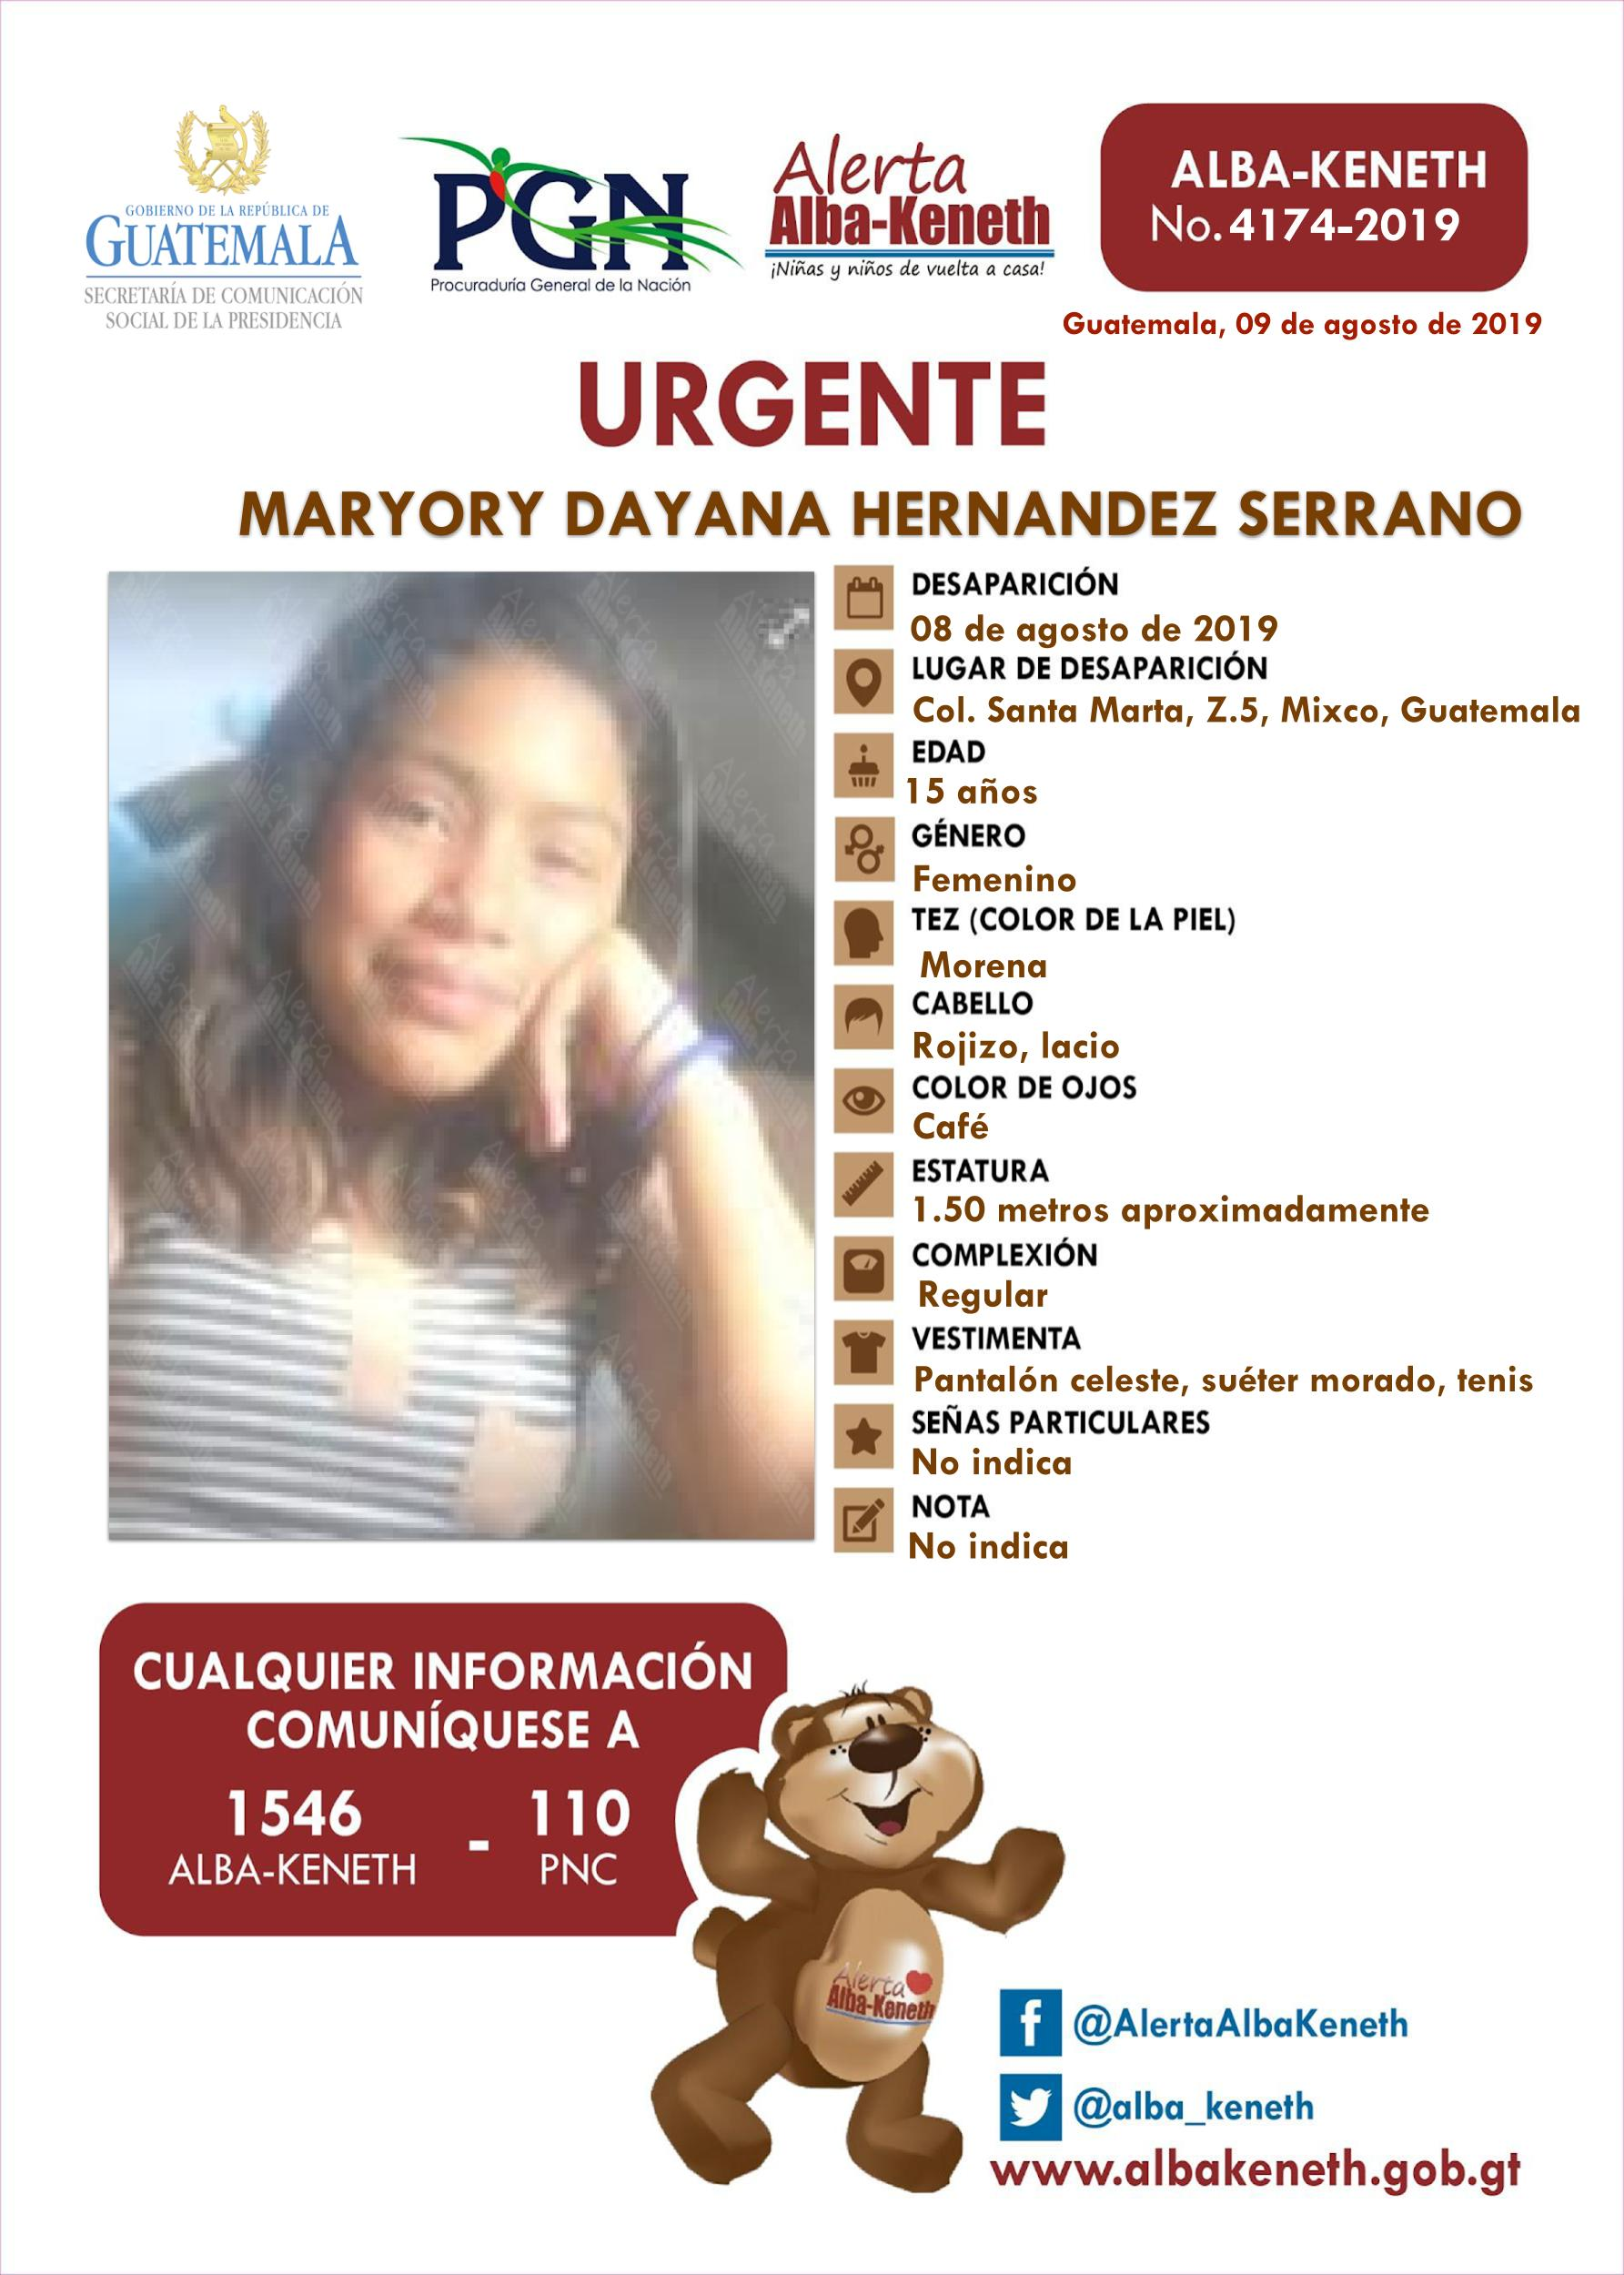 Maryory Dayana Hernandez Serrano